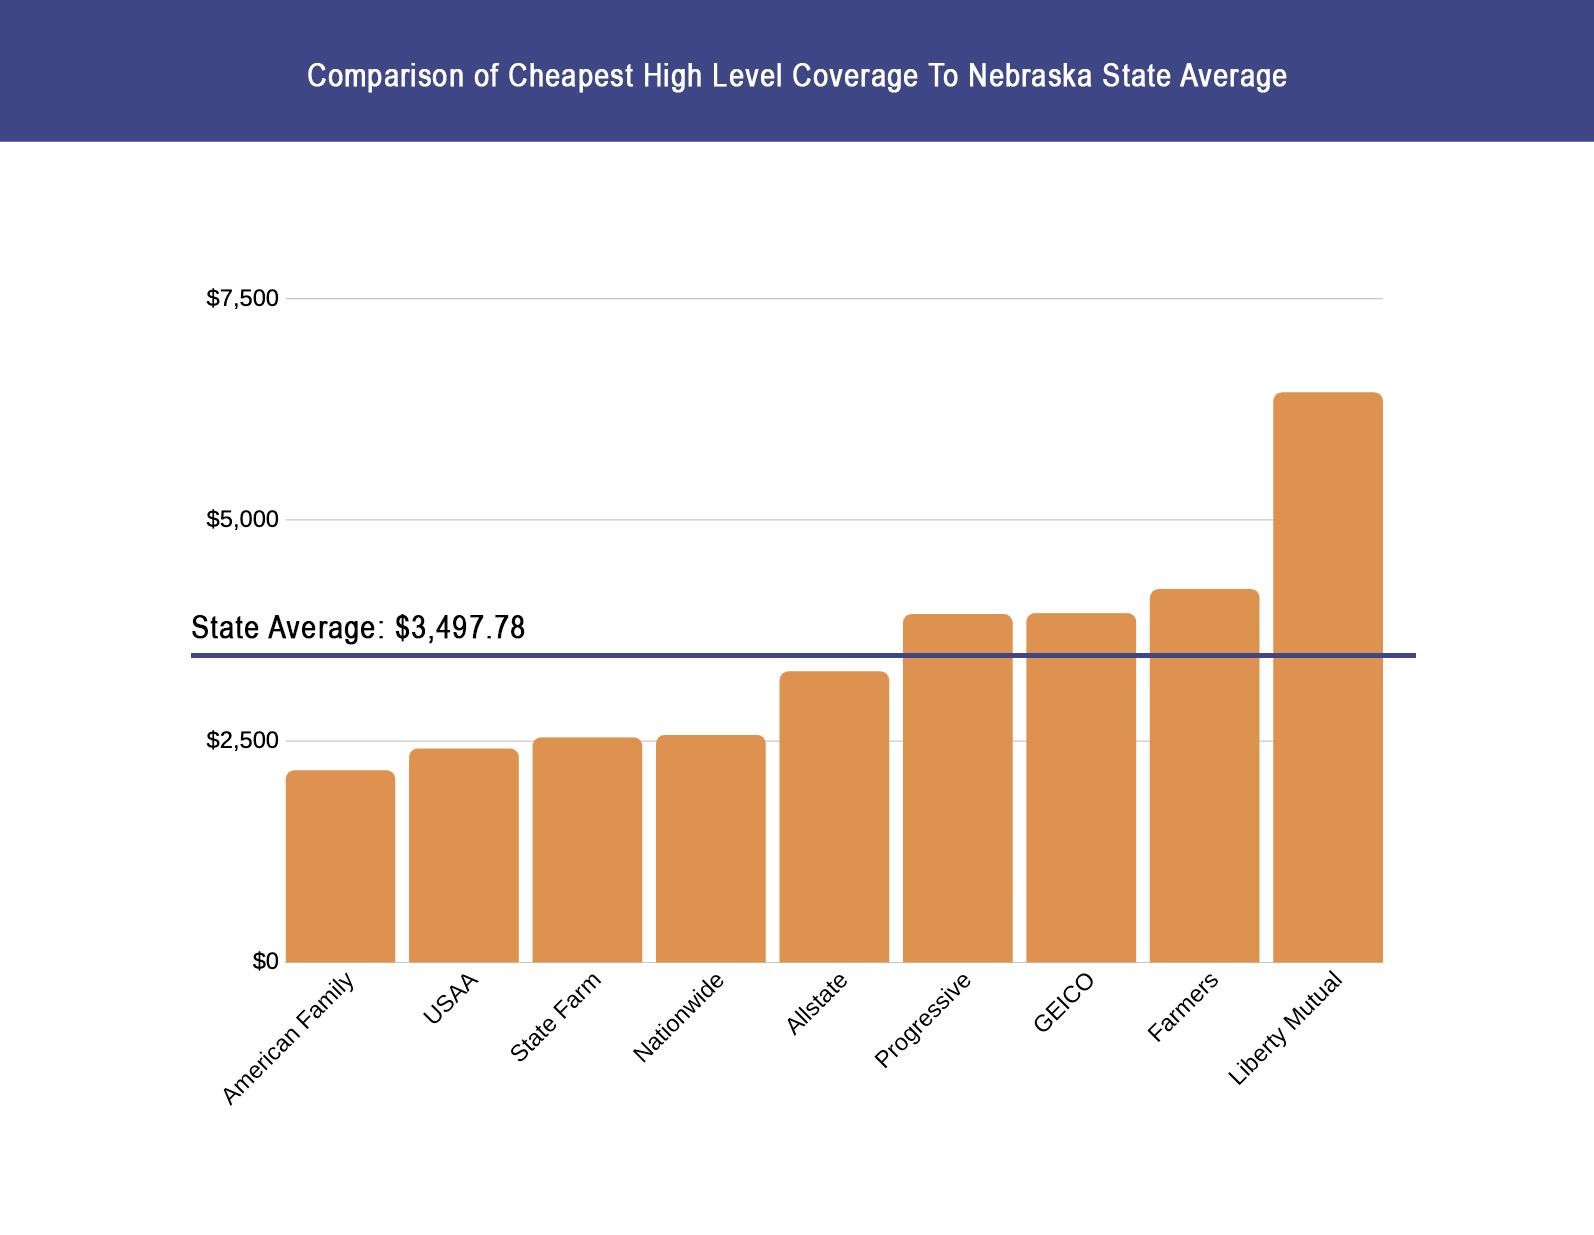 Comparison of Cheapest High Level Coverage To Nebraska State Average